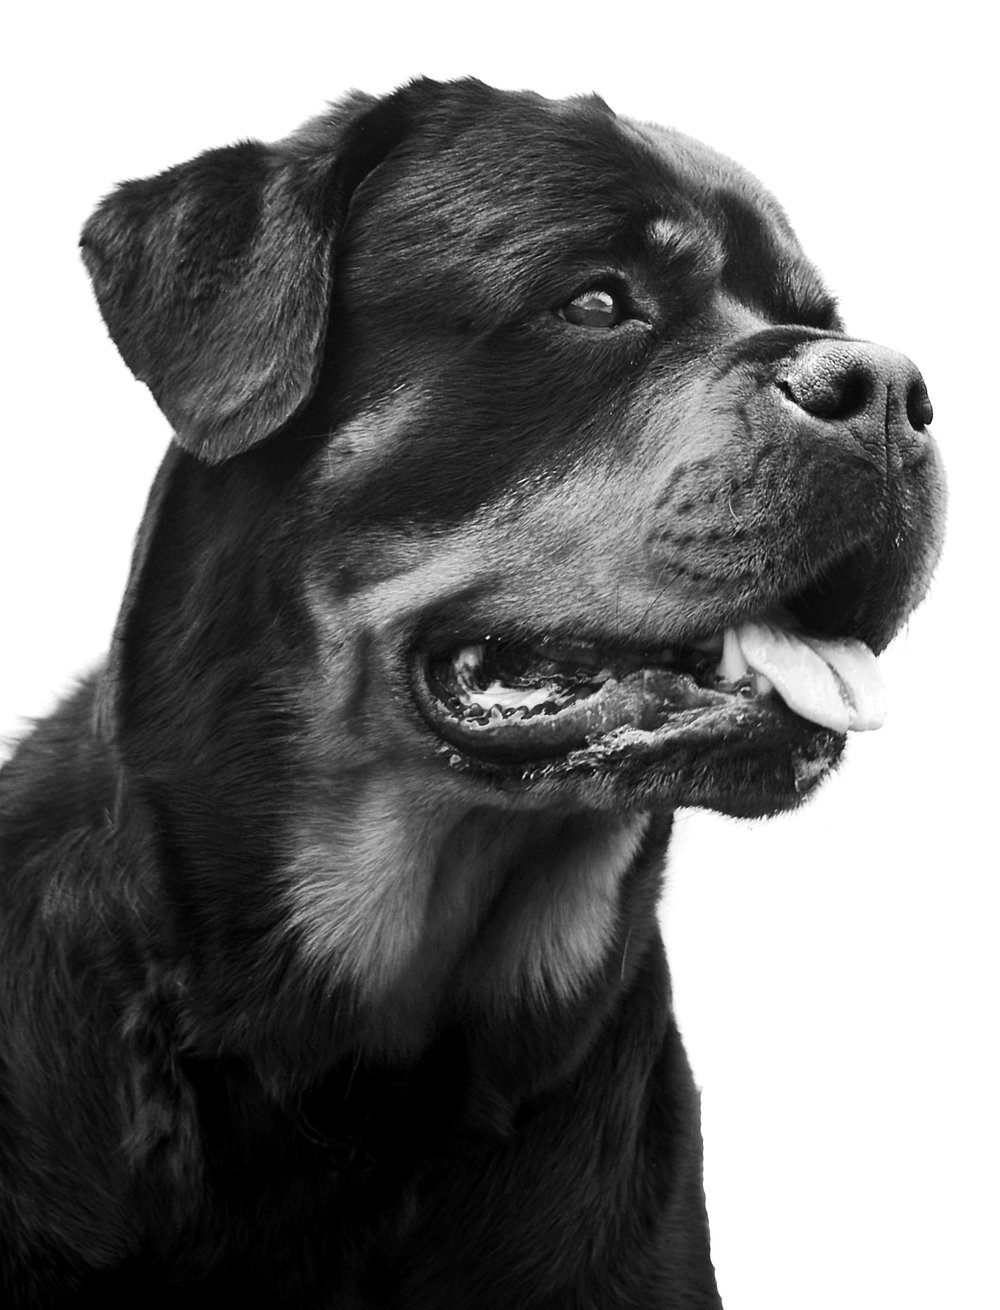 DOG BOOK pics 1034redobw.jpg